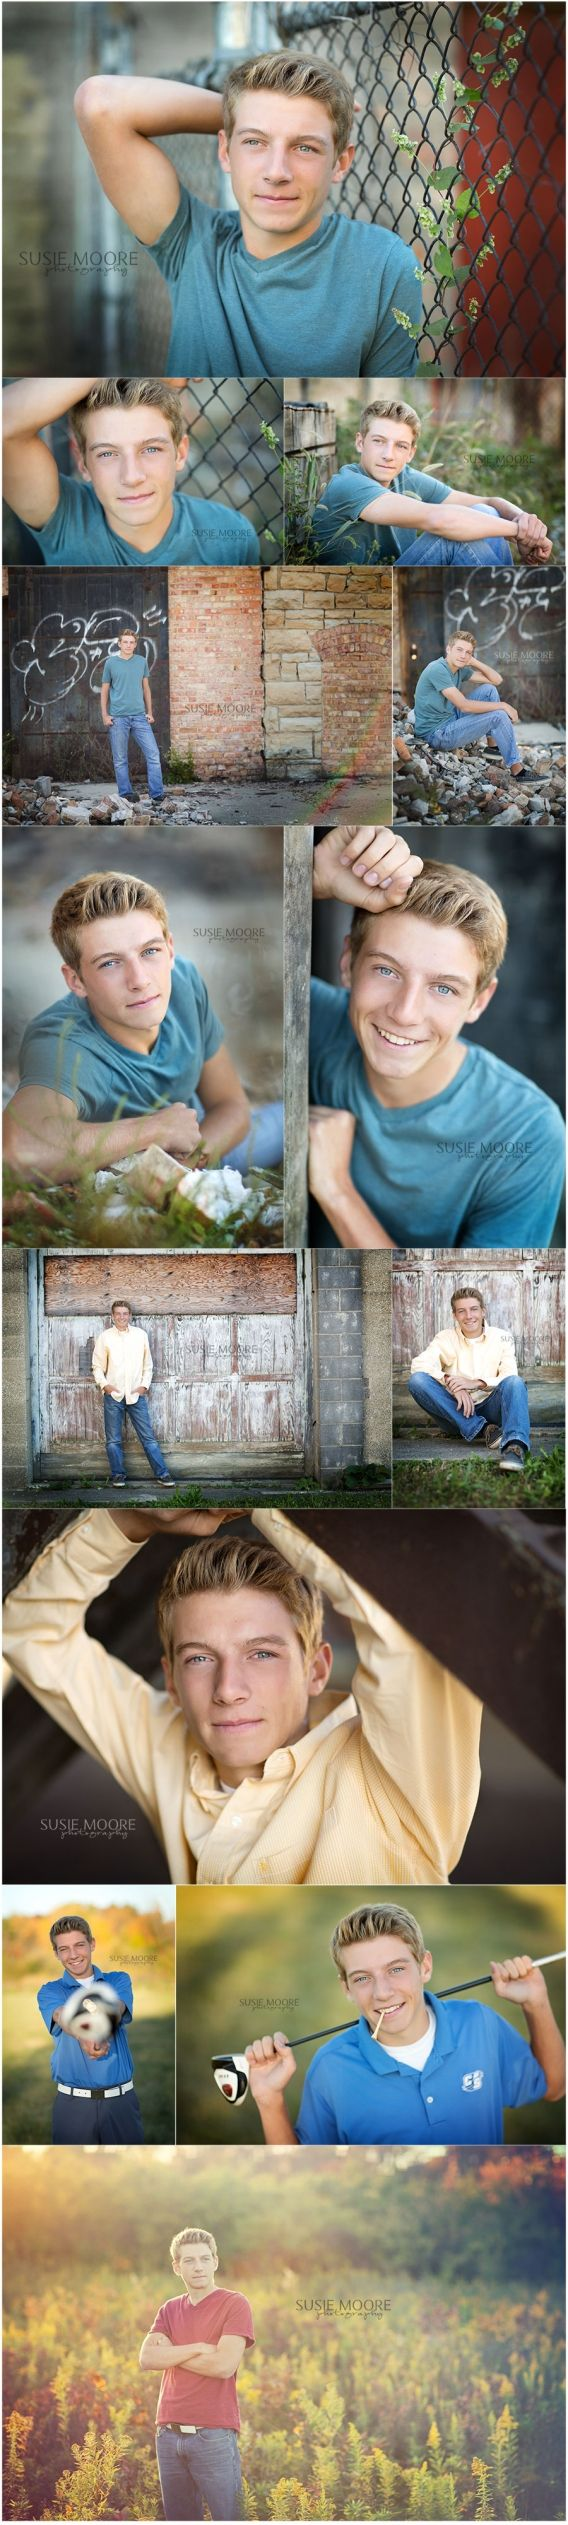 Luke | Carl Sandburg High School | IL Senior Photographer | Susie Moore Photography